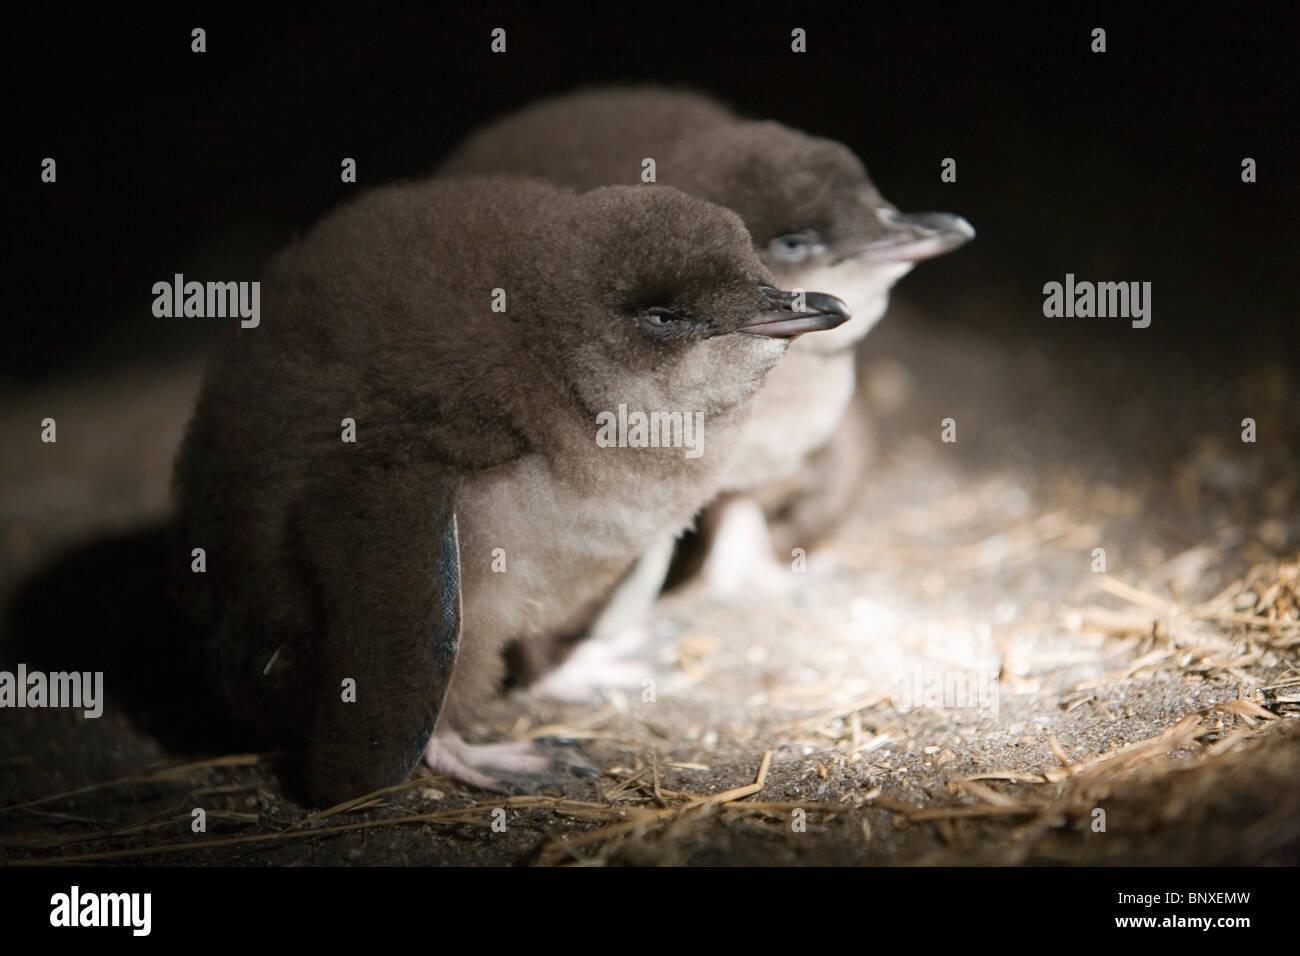 Des manchots pygmées bébé (Eudyptula minor). Redbill Beach, Bicheno, Tasmanie, Australie Photo Stock